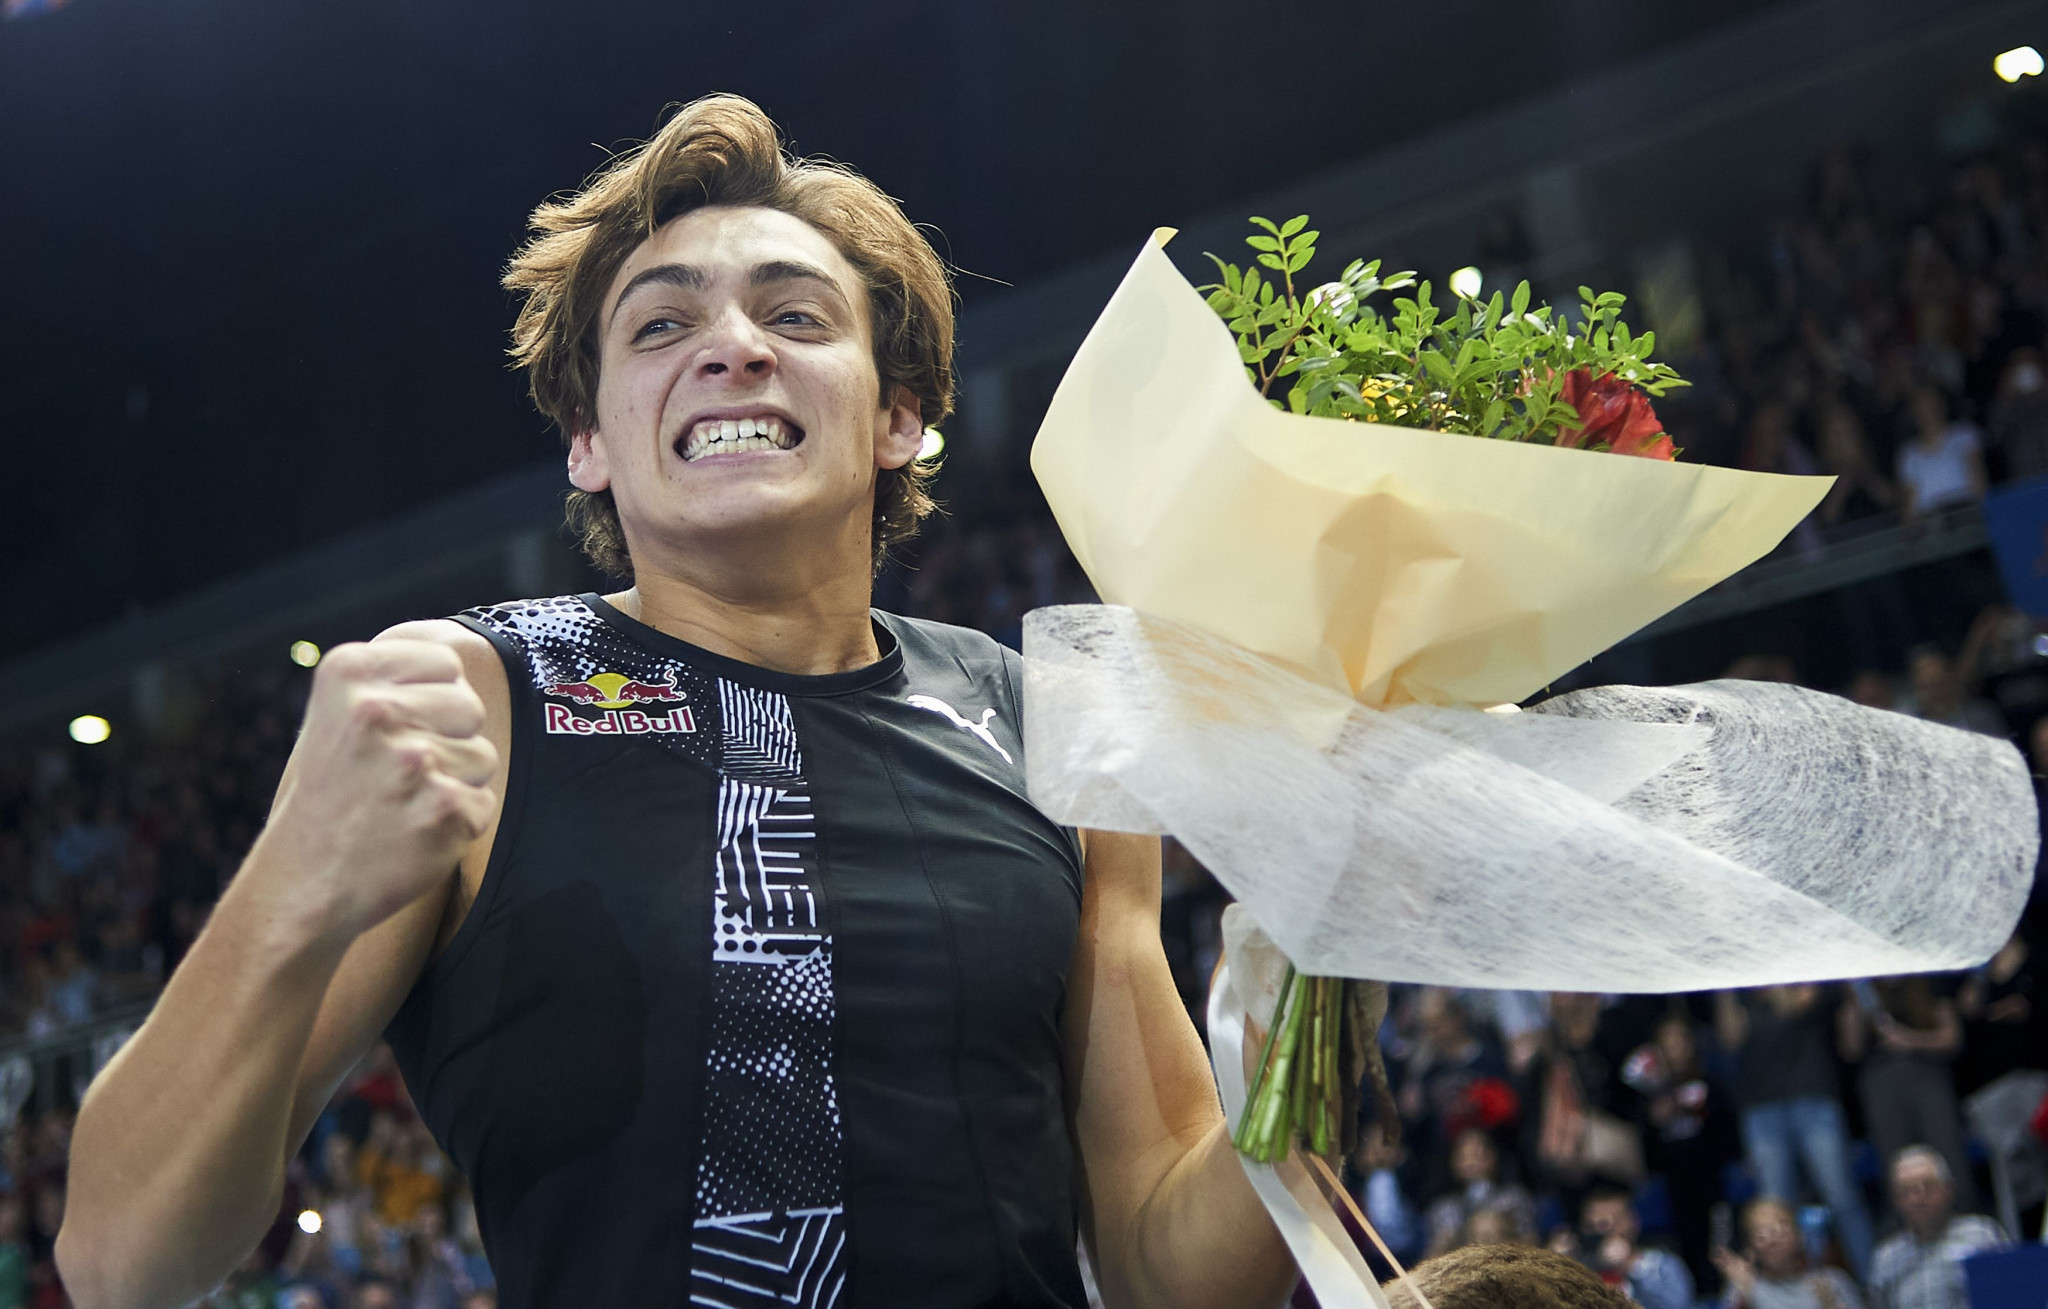 World record holder Duplantis headlines Glasgow leg of World Athletics Indoor Tour